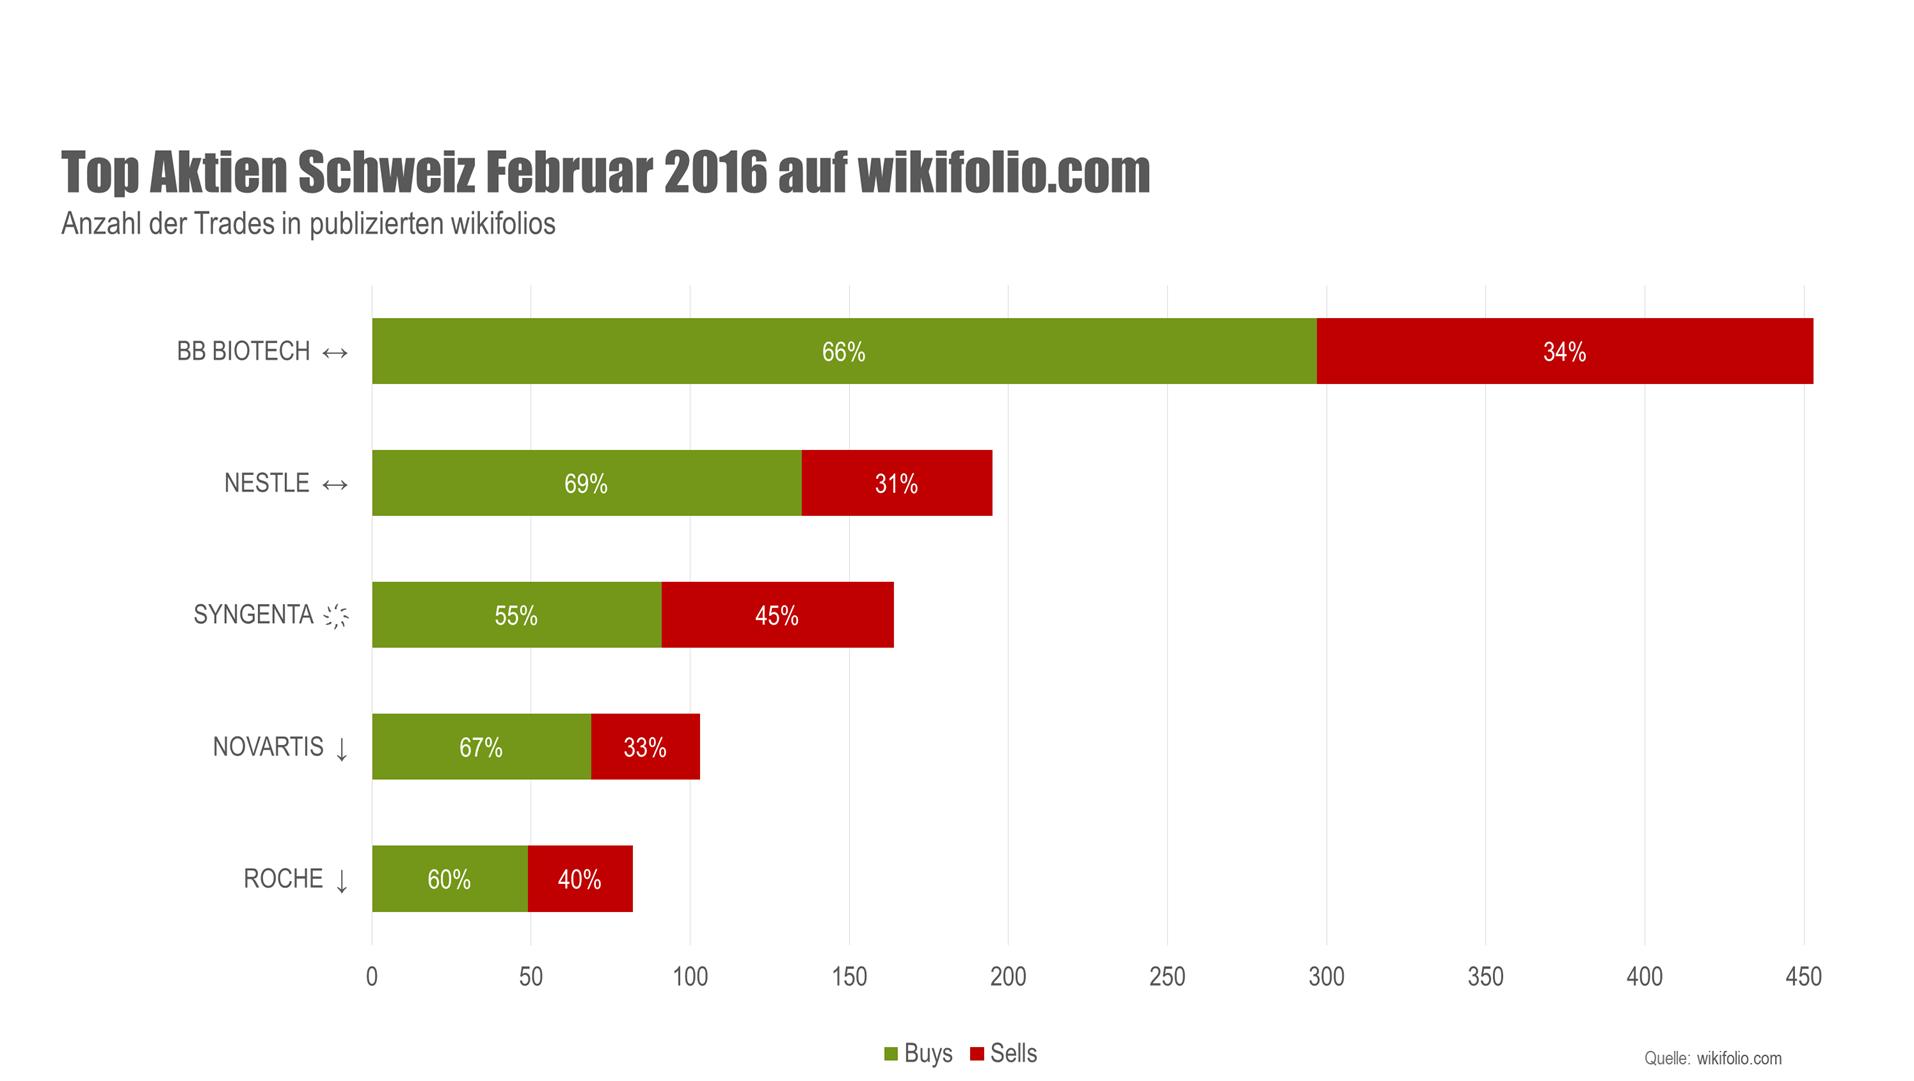 Top Aktien Schweiz Februar 2016